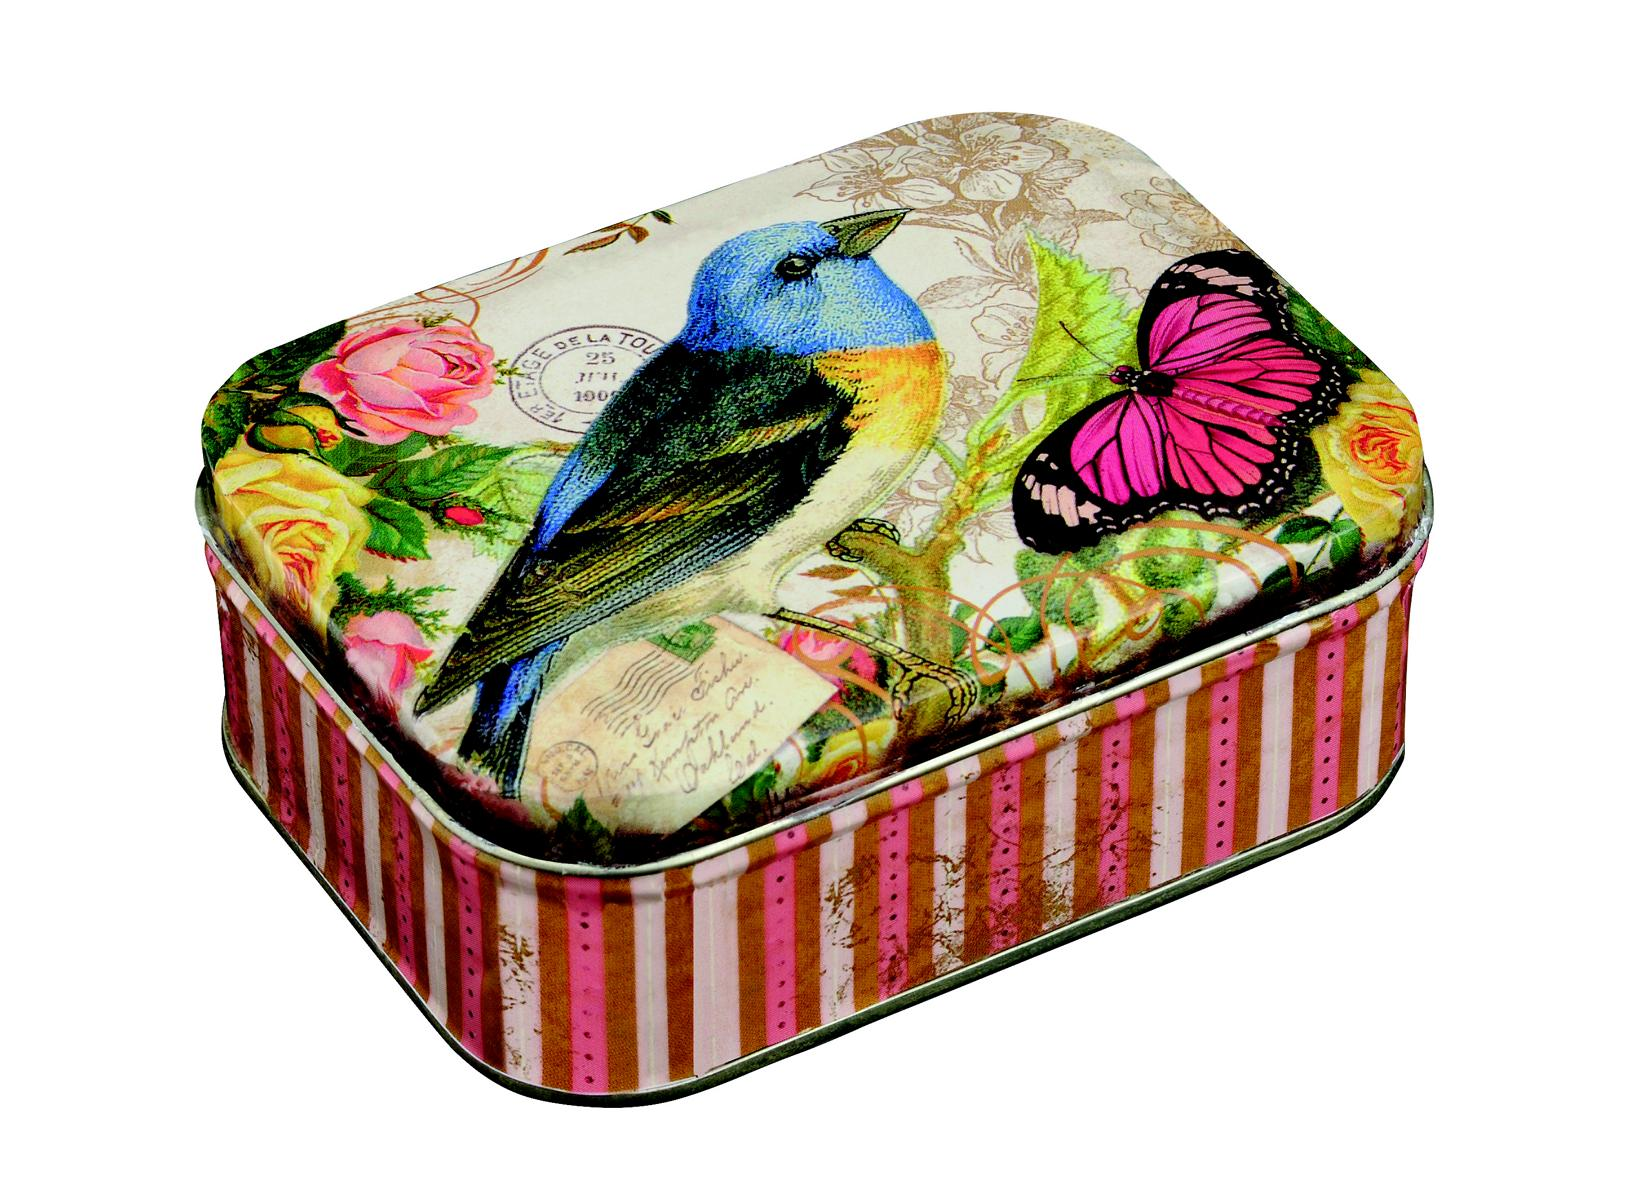 Nostalgie Blechdose Vogel Schmetterling Motiv, 11x8 cm